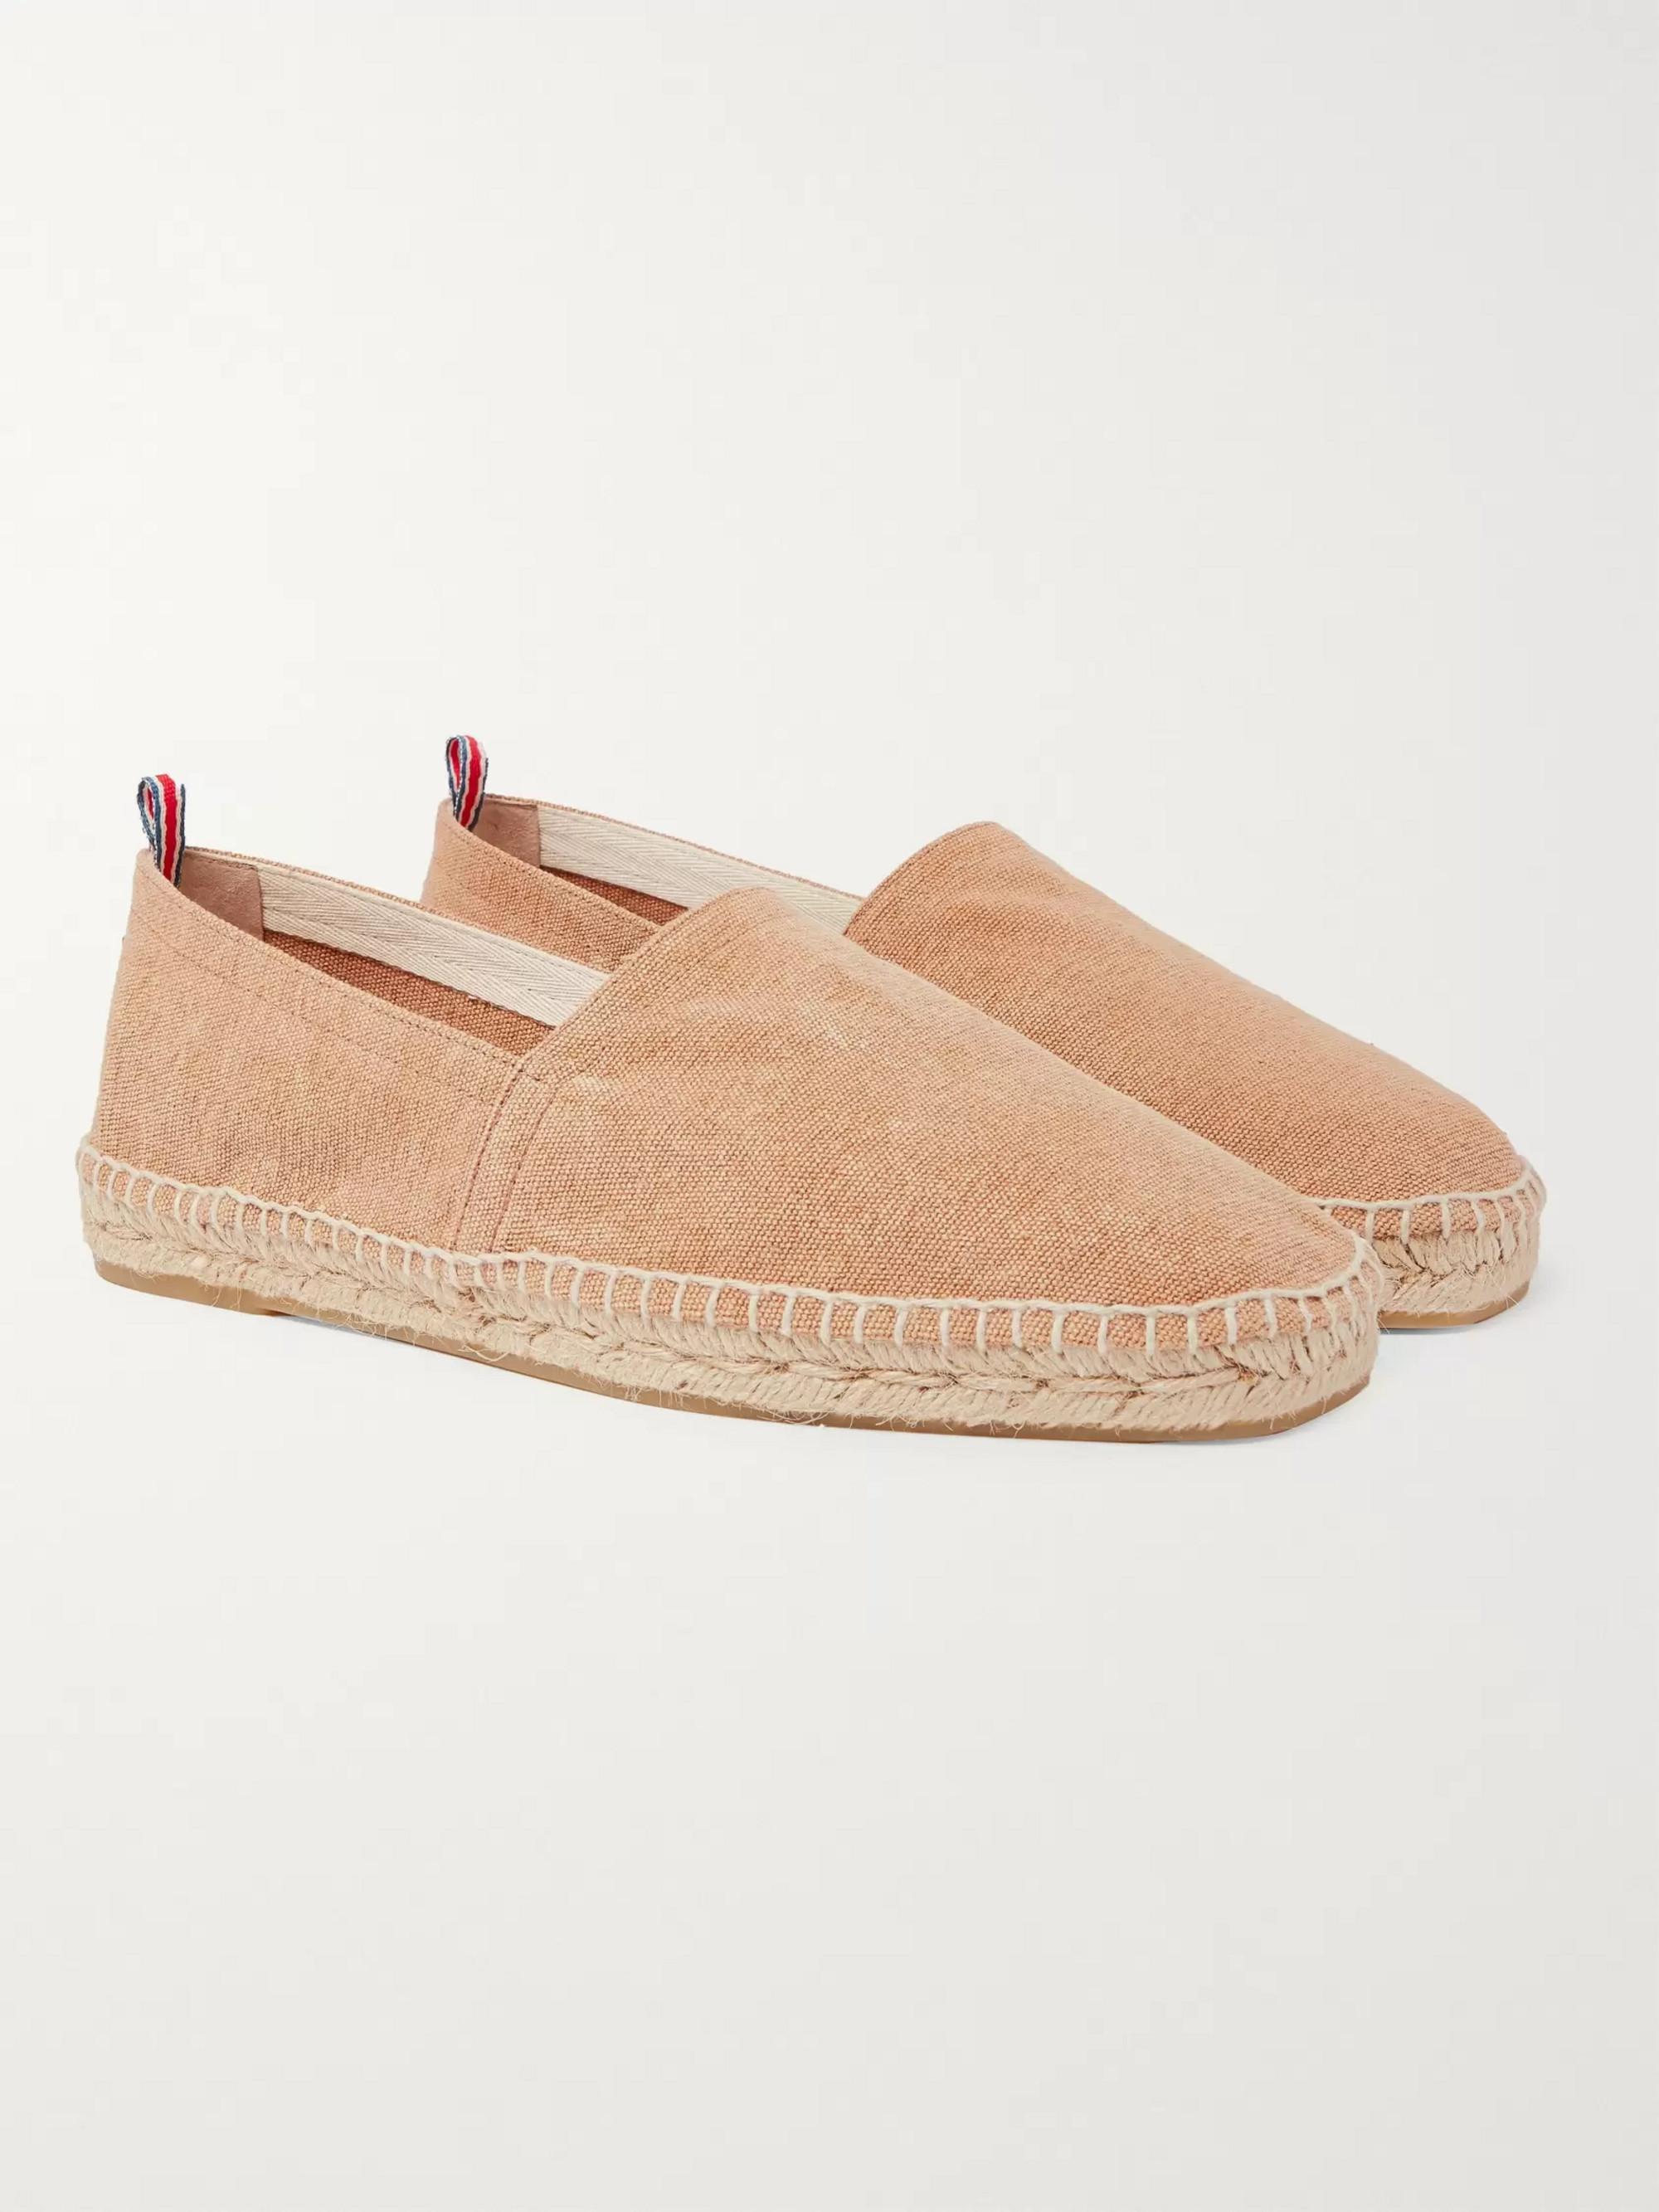 32a20e9d3 Shoes for Men | Designer Sportswear | MR PORTER